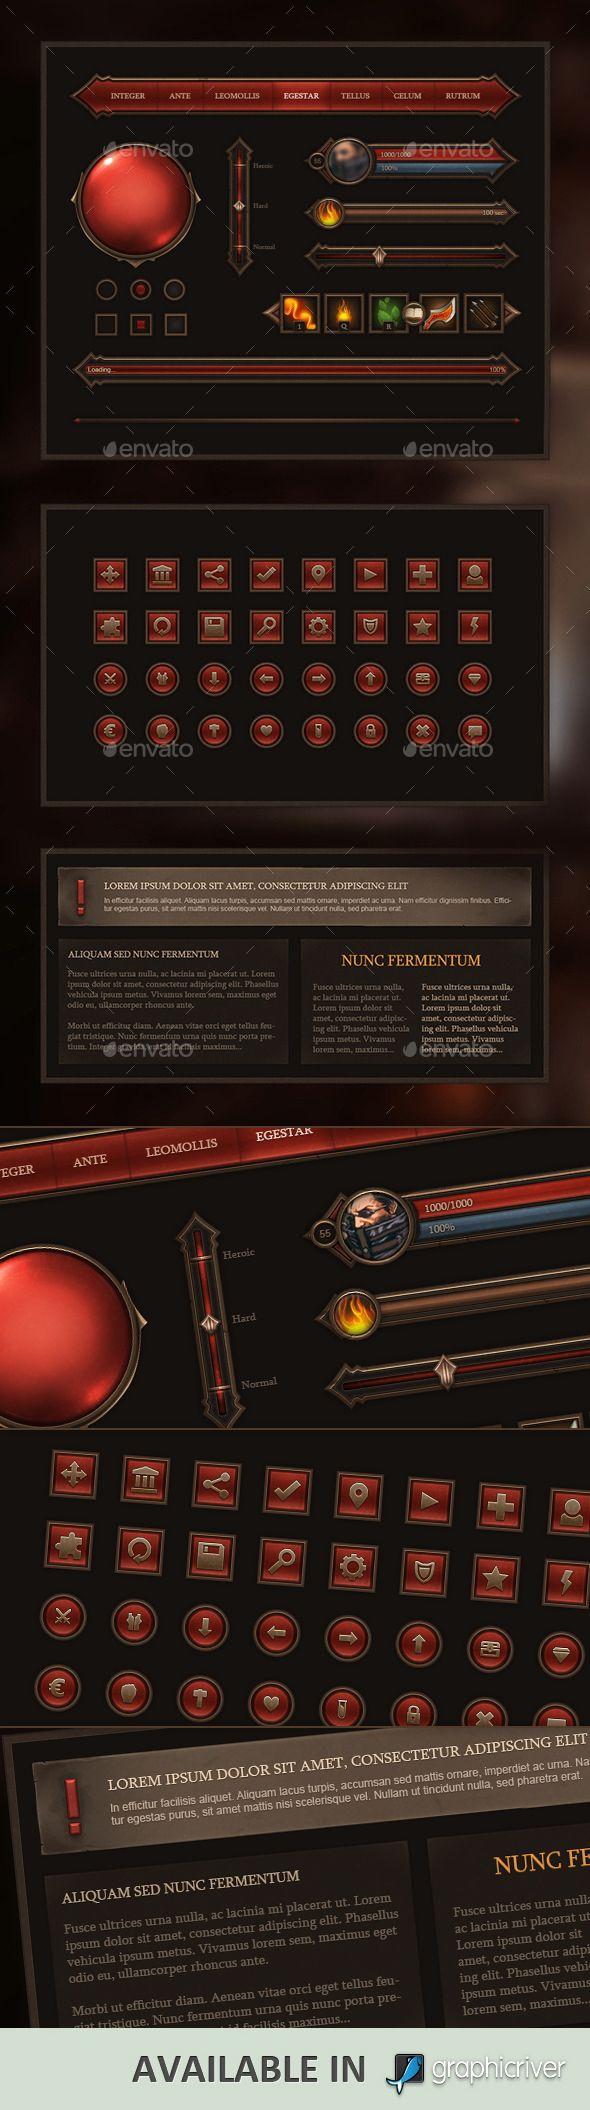 Fantasy Game Interface by Evil-S.deviantart.com on @DeviantArt